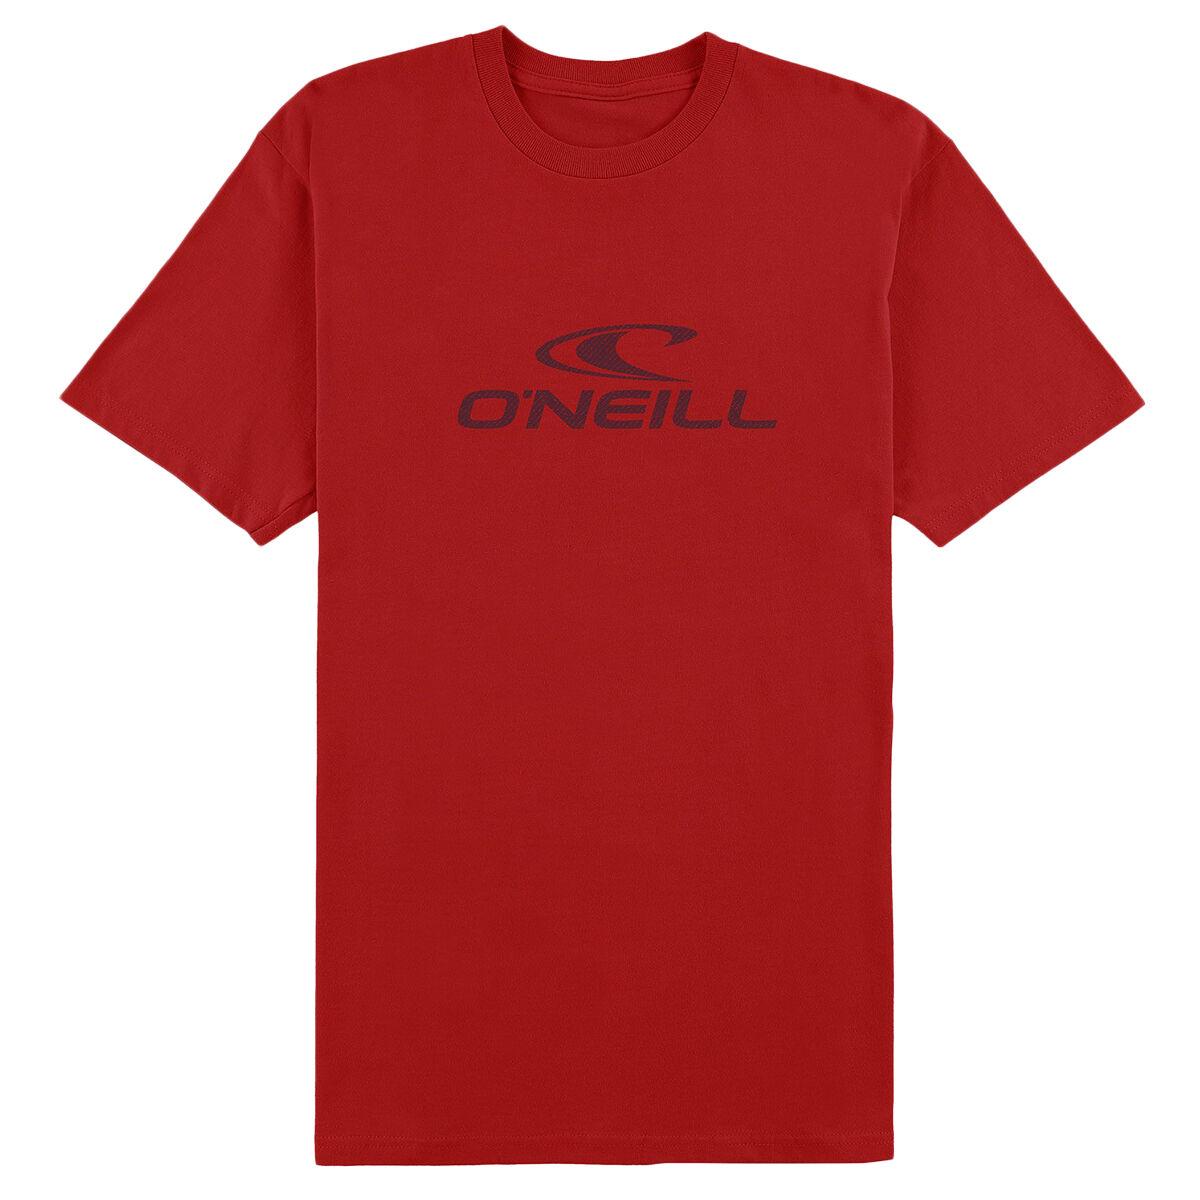 O'neill Men's Supreme Short-Sleeve Tee - Red, XL